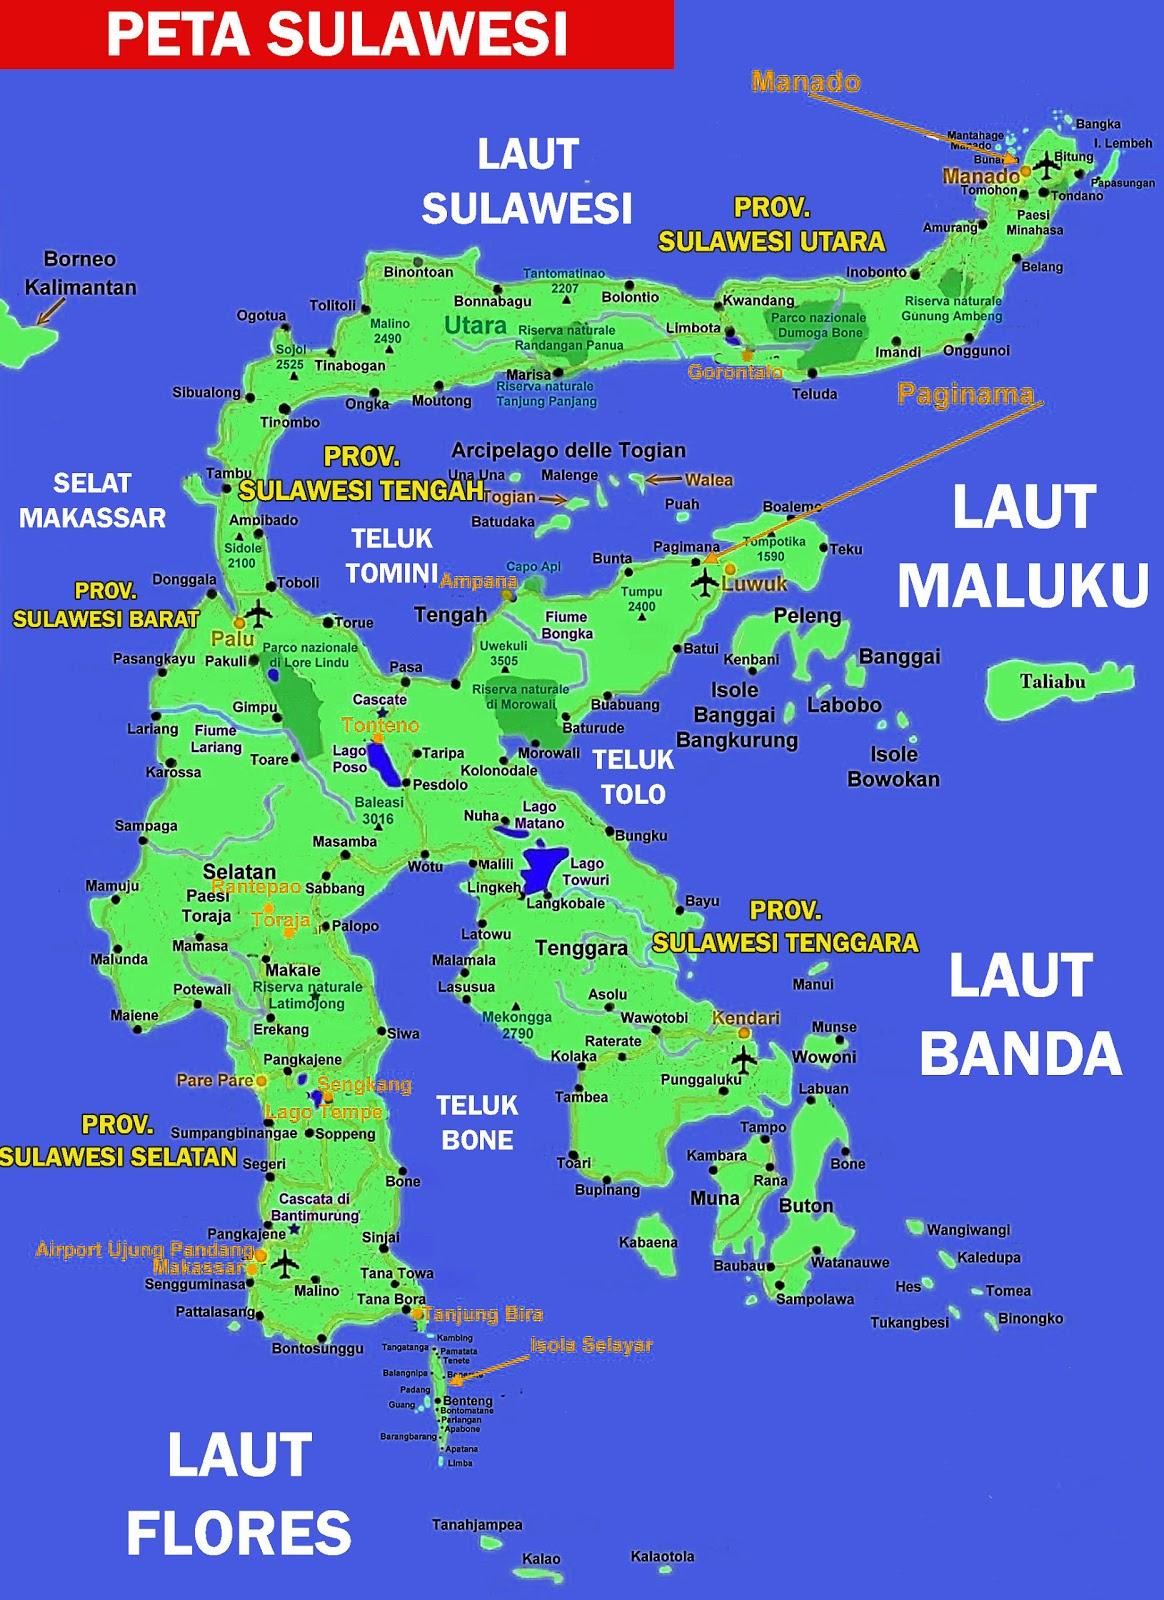 Peta Sulawesi Lengkap 5 Provinsi Sejarah Negara Gambar Hd Buta